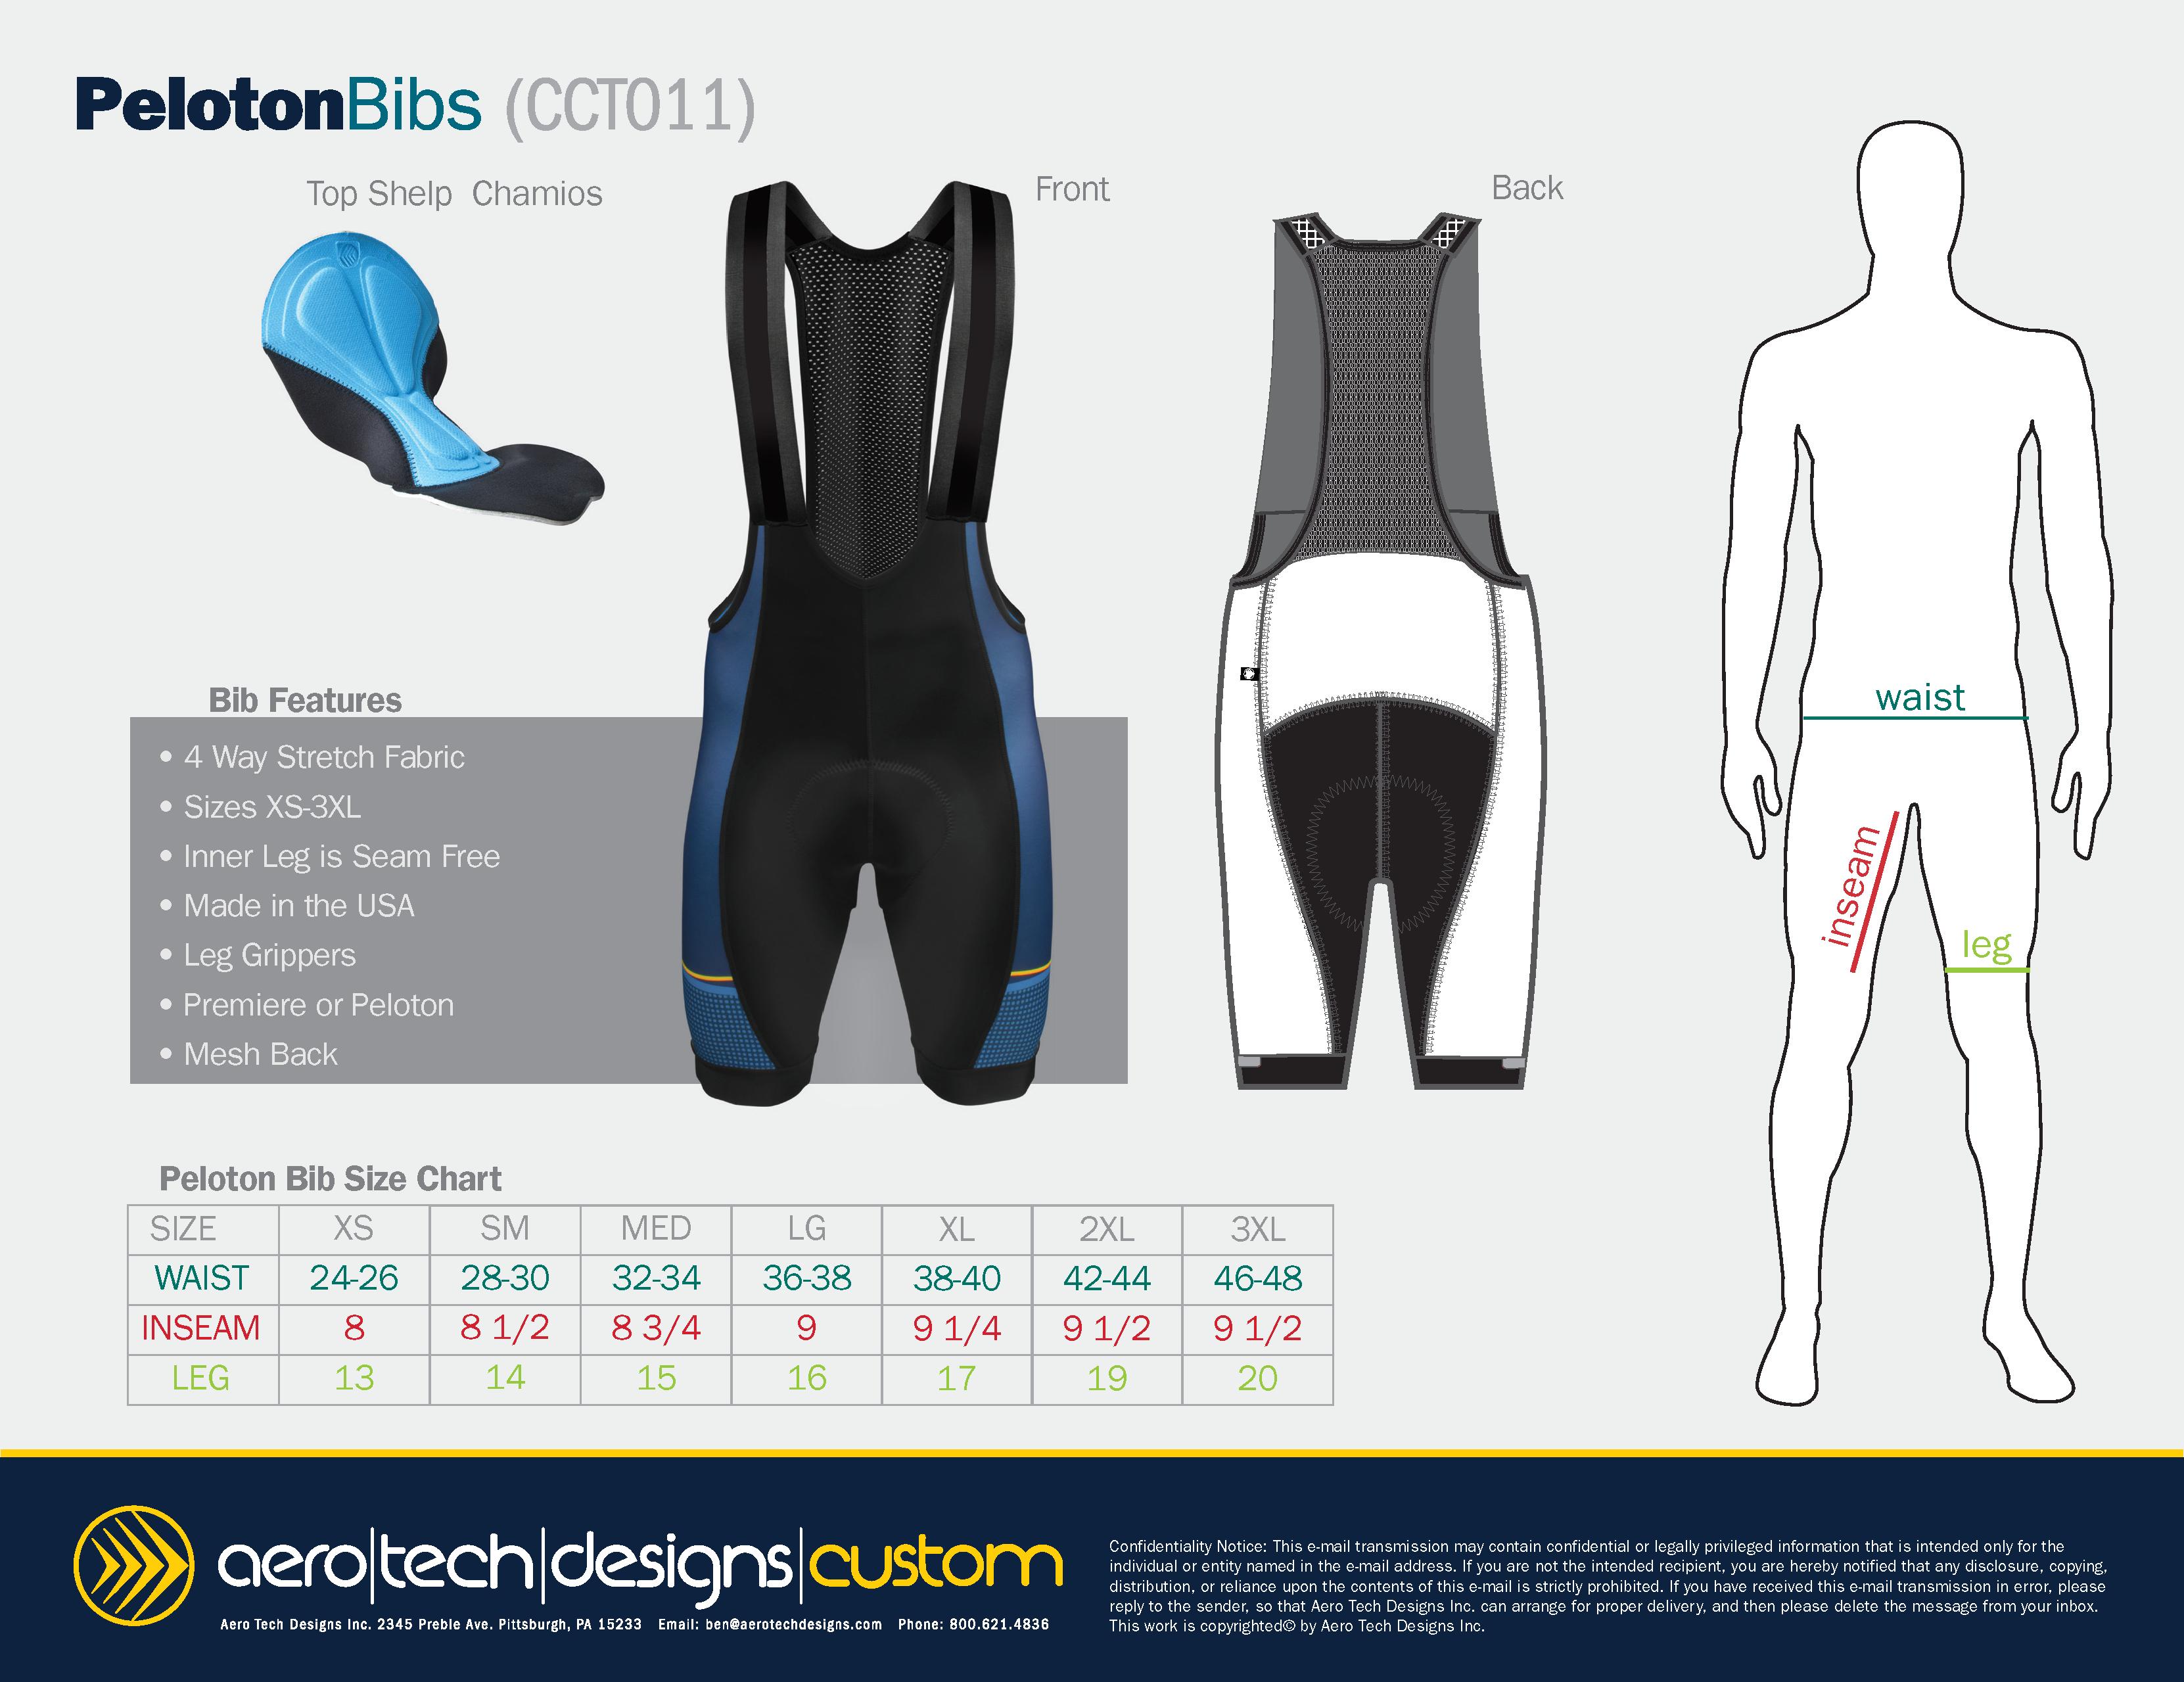 size-chart-pelotonbibshorts-cct011.png